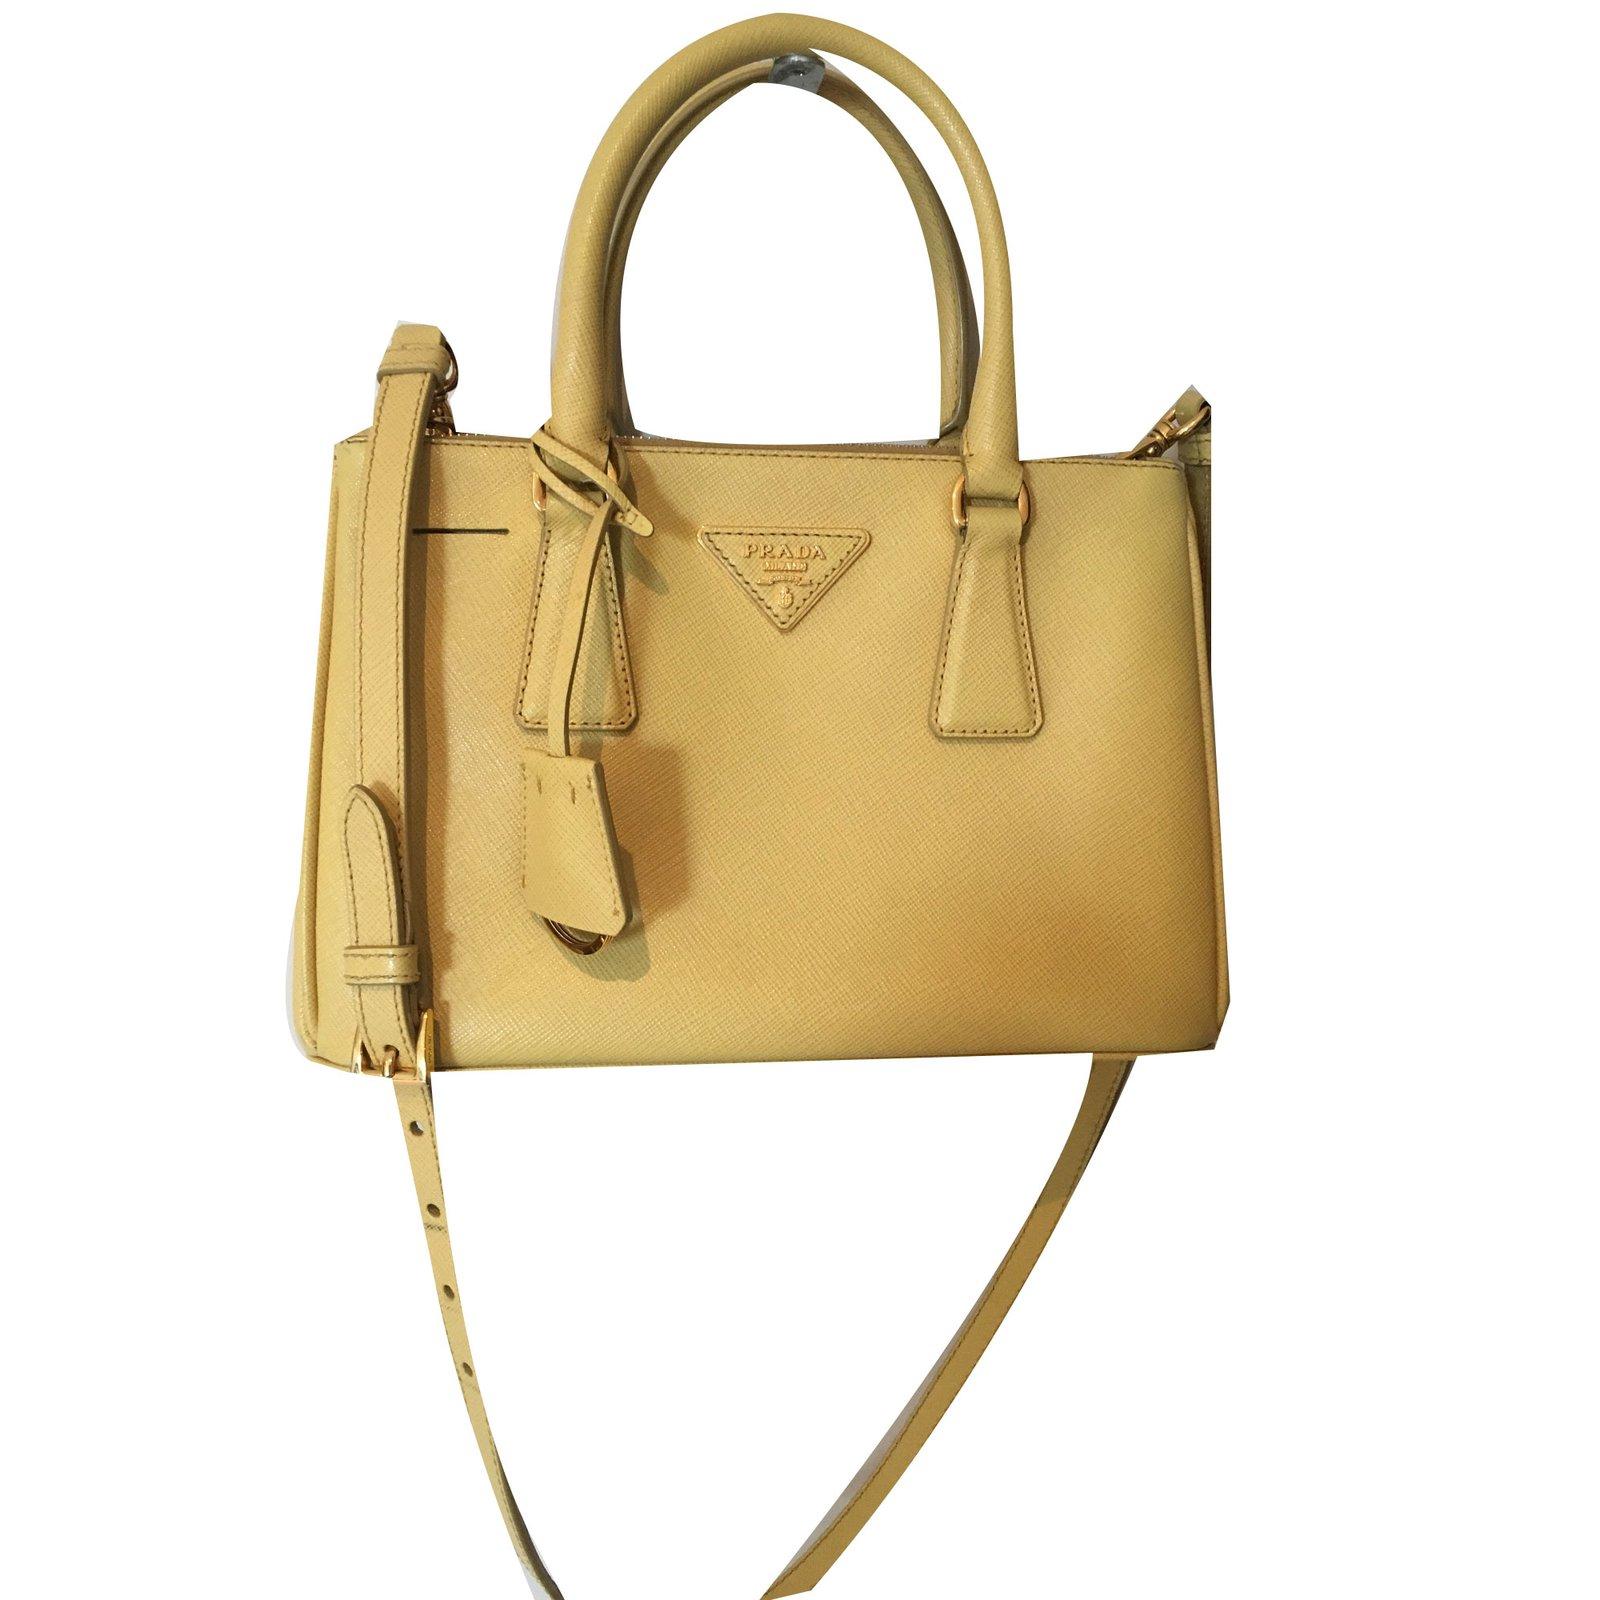 2f17d224bca ... bag astral blue sunny yellow 68eef 11356  aliexpress prada galleria  handbags leather yellow ref.72052 903a8 3a475